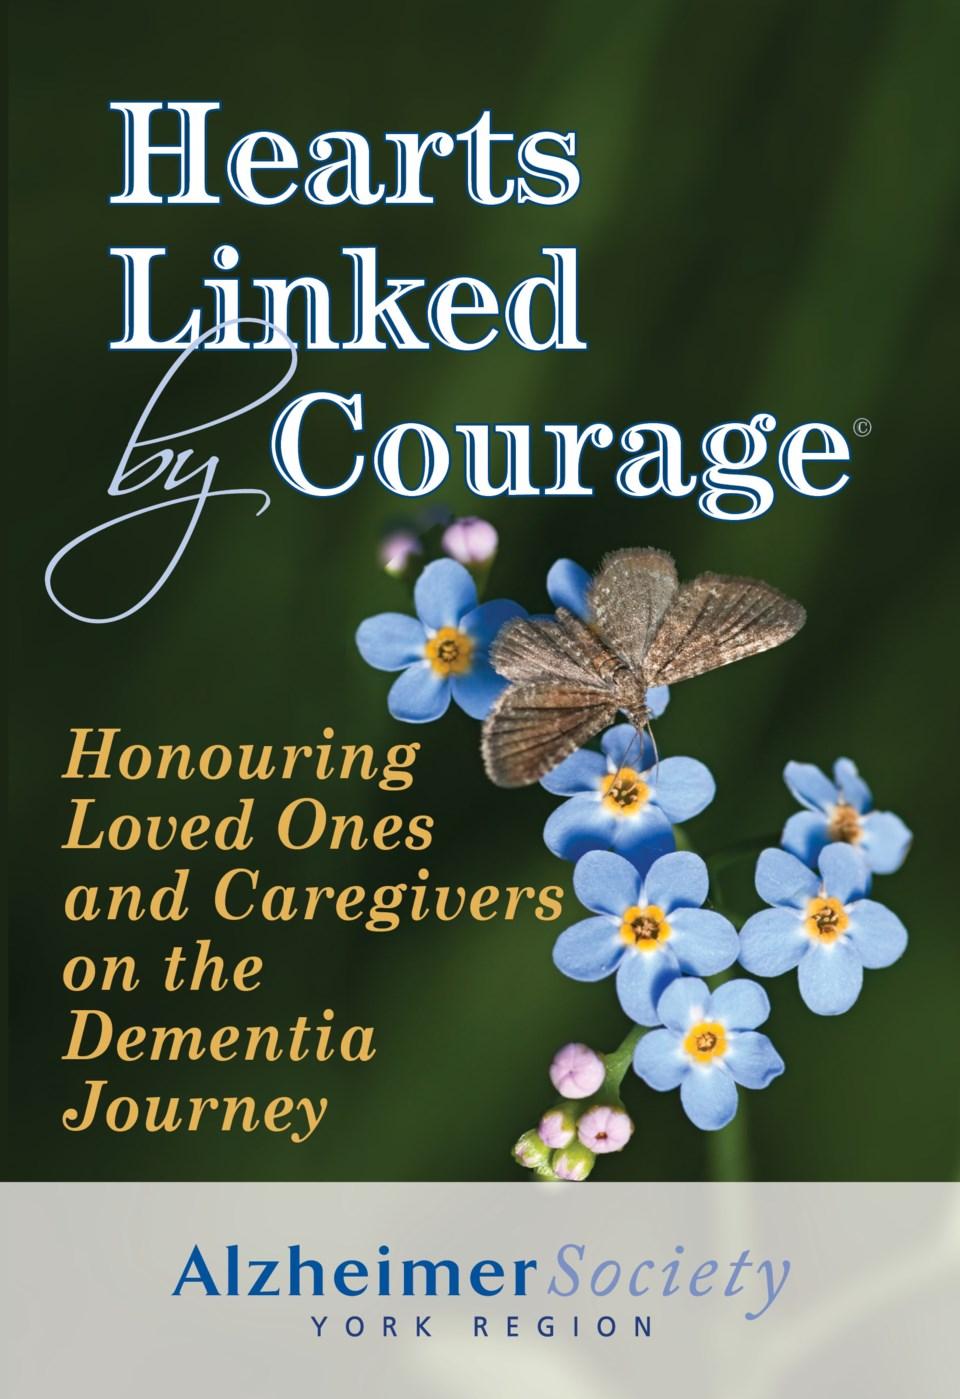 Hearts_linked_cover Book 4  York Alzheimer Society HR